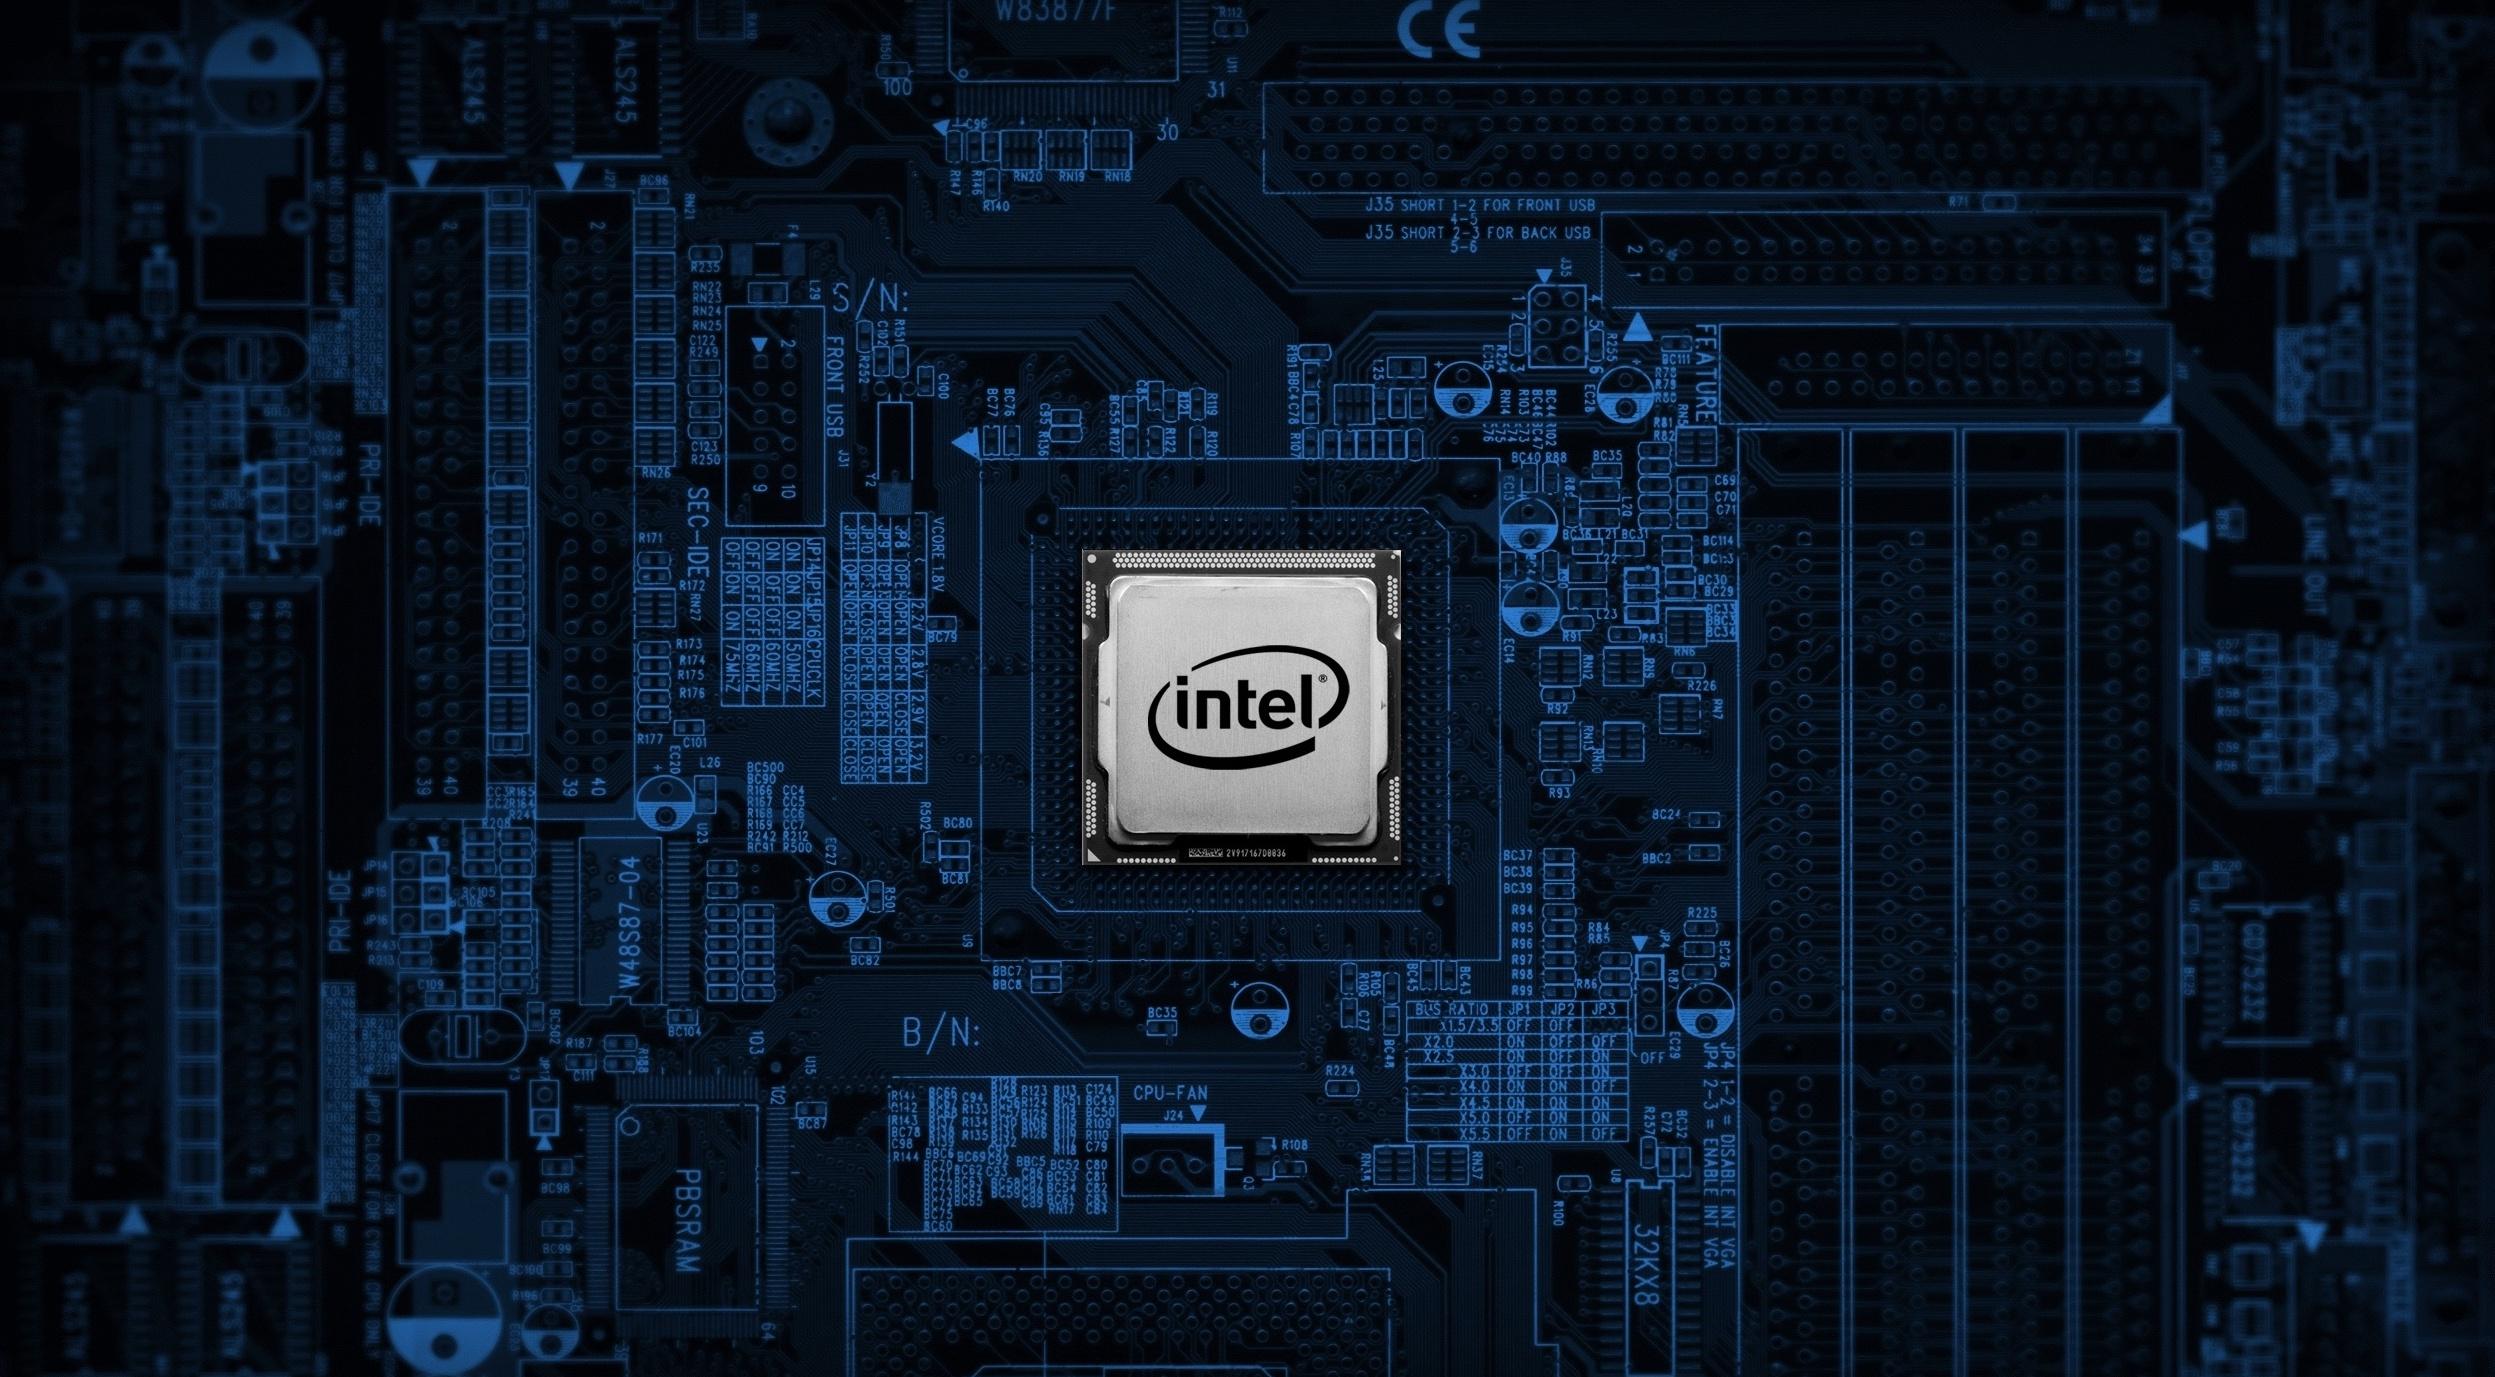 intel_motherboard-wallpaper-2560x1440.jpg